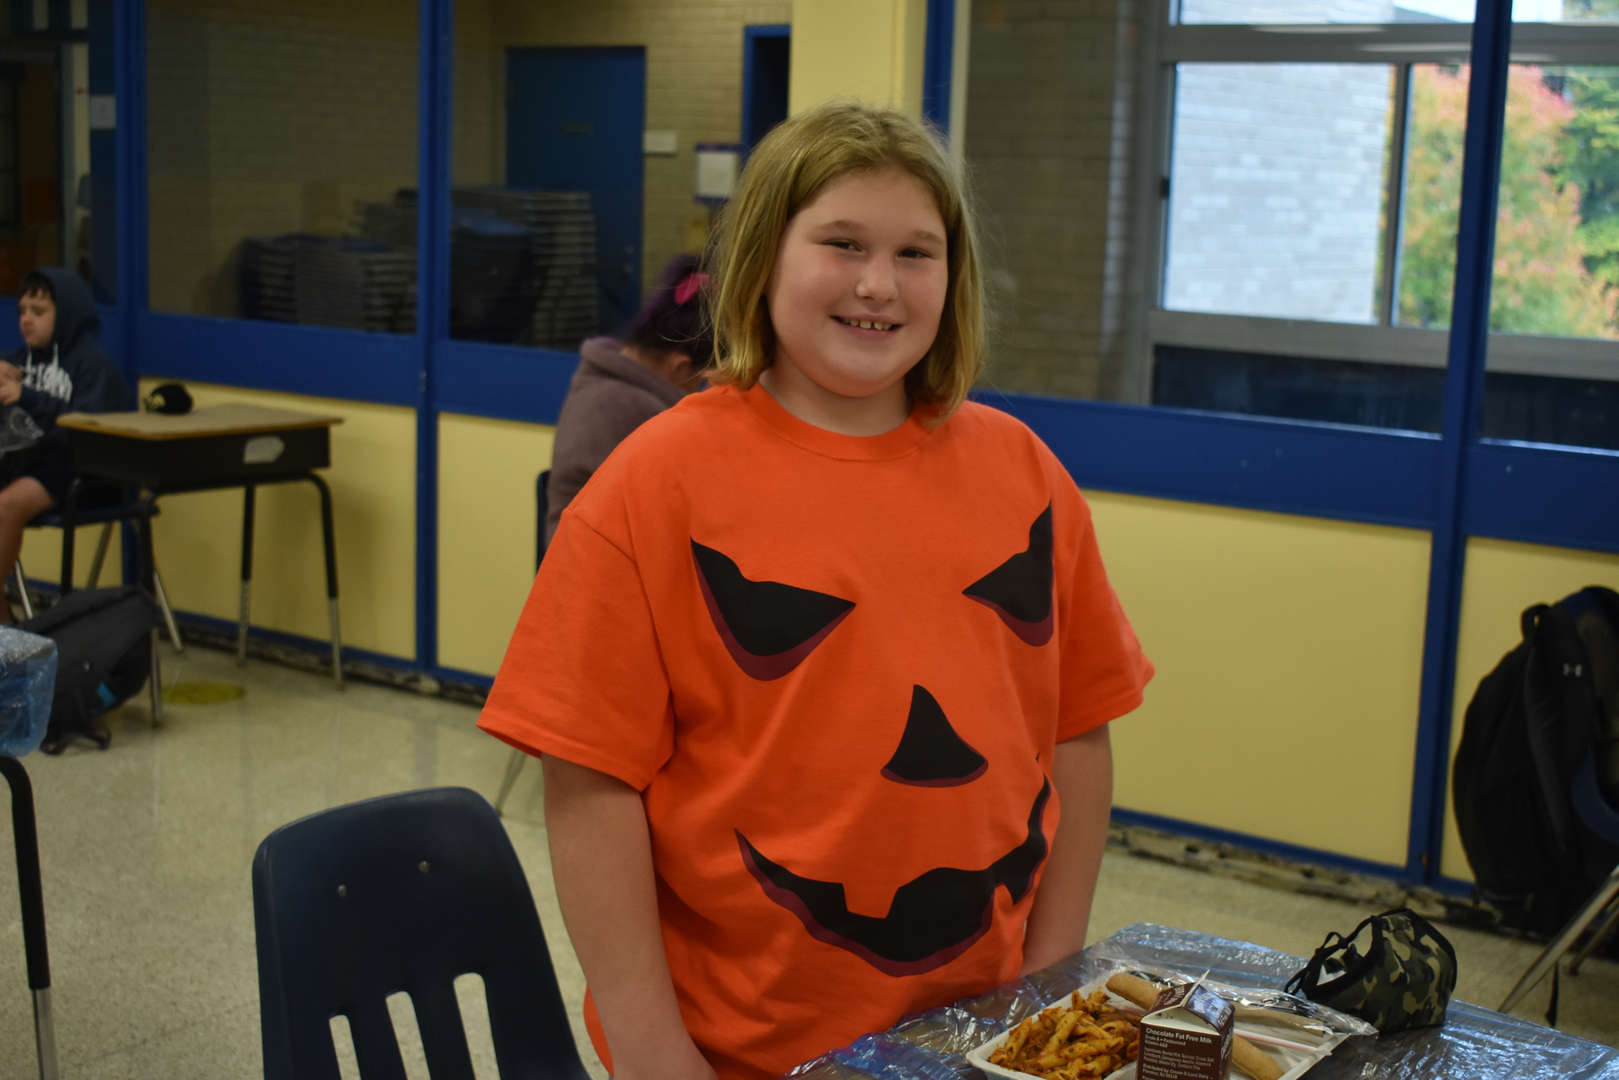 Halloween shirt at lunch